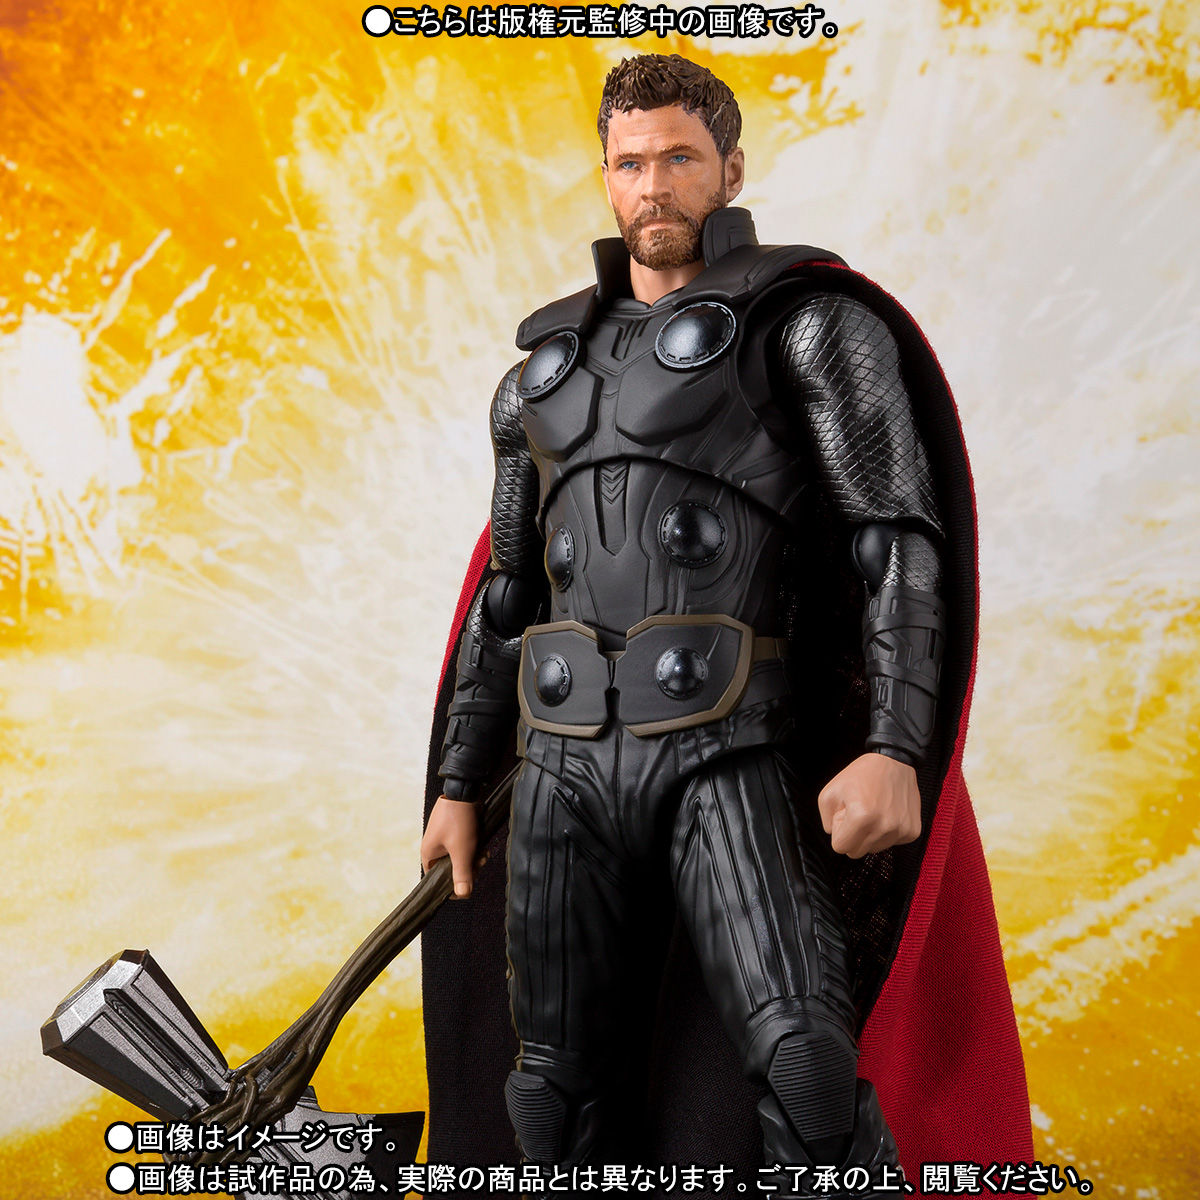 Bandai SHFiguarts Avengers Infinity War Thor